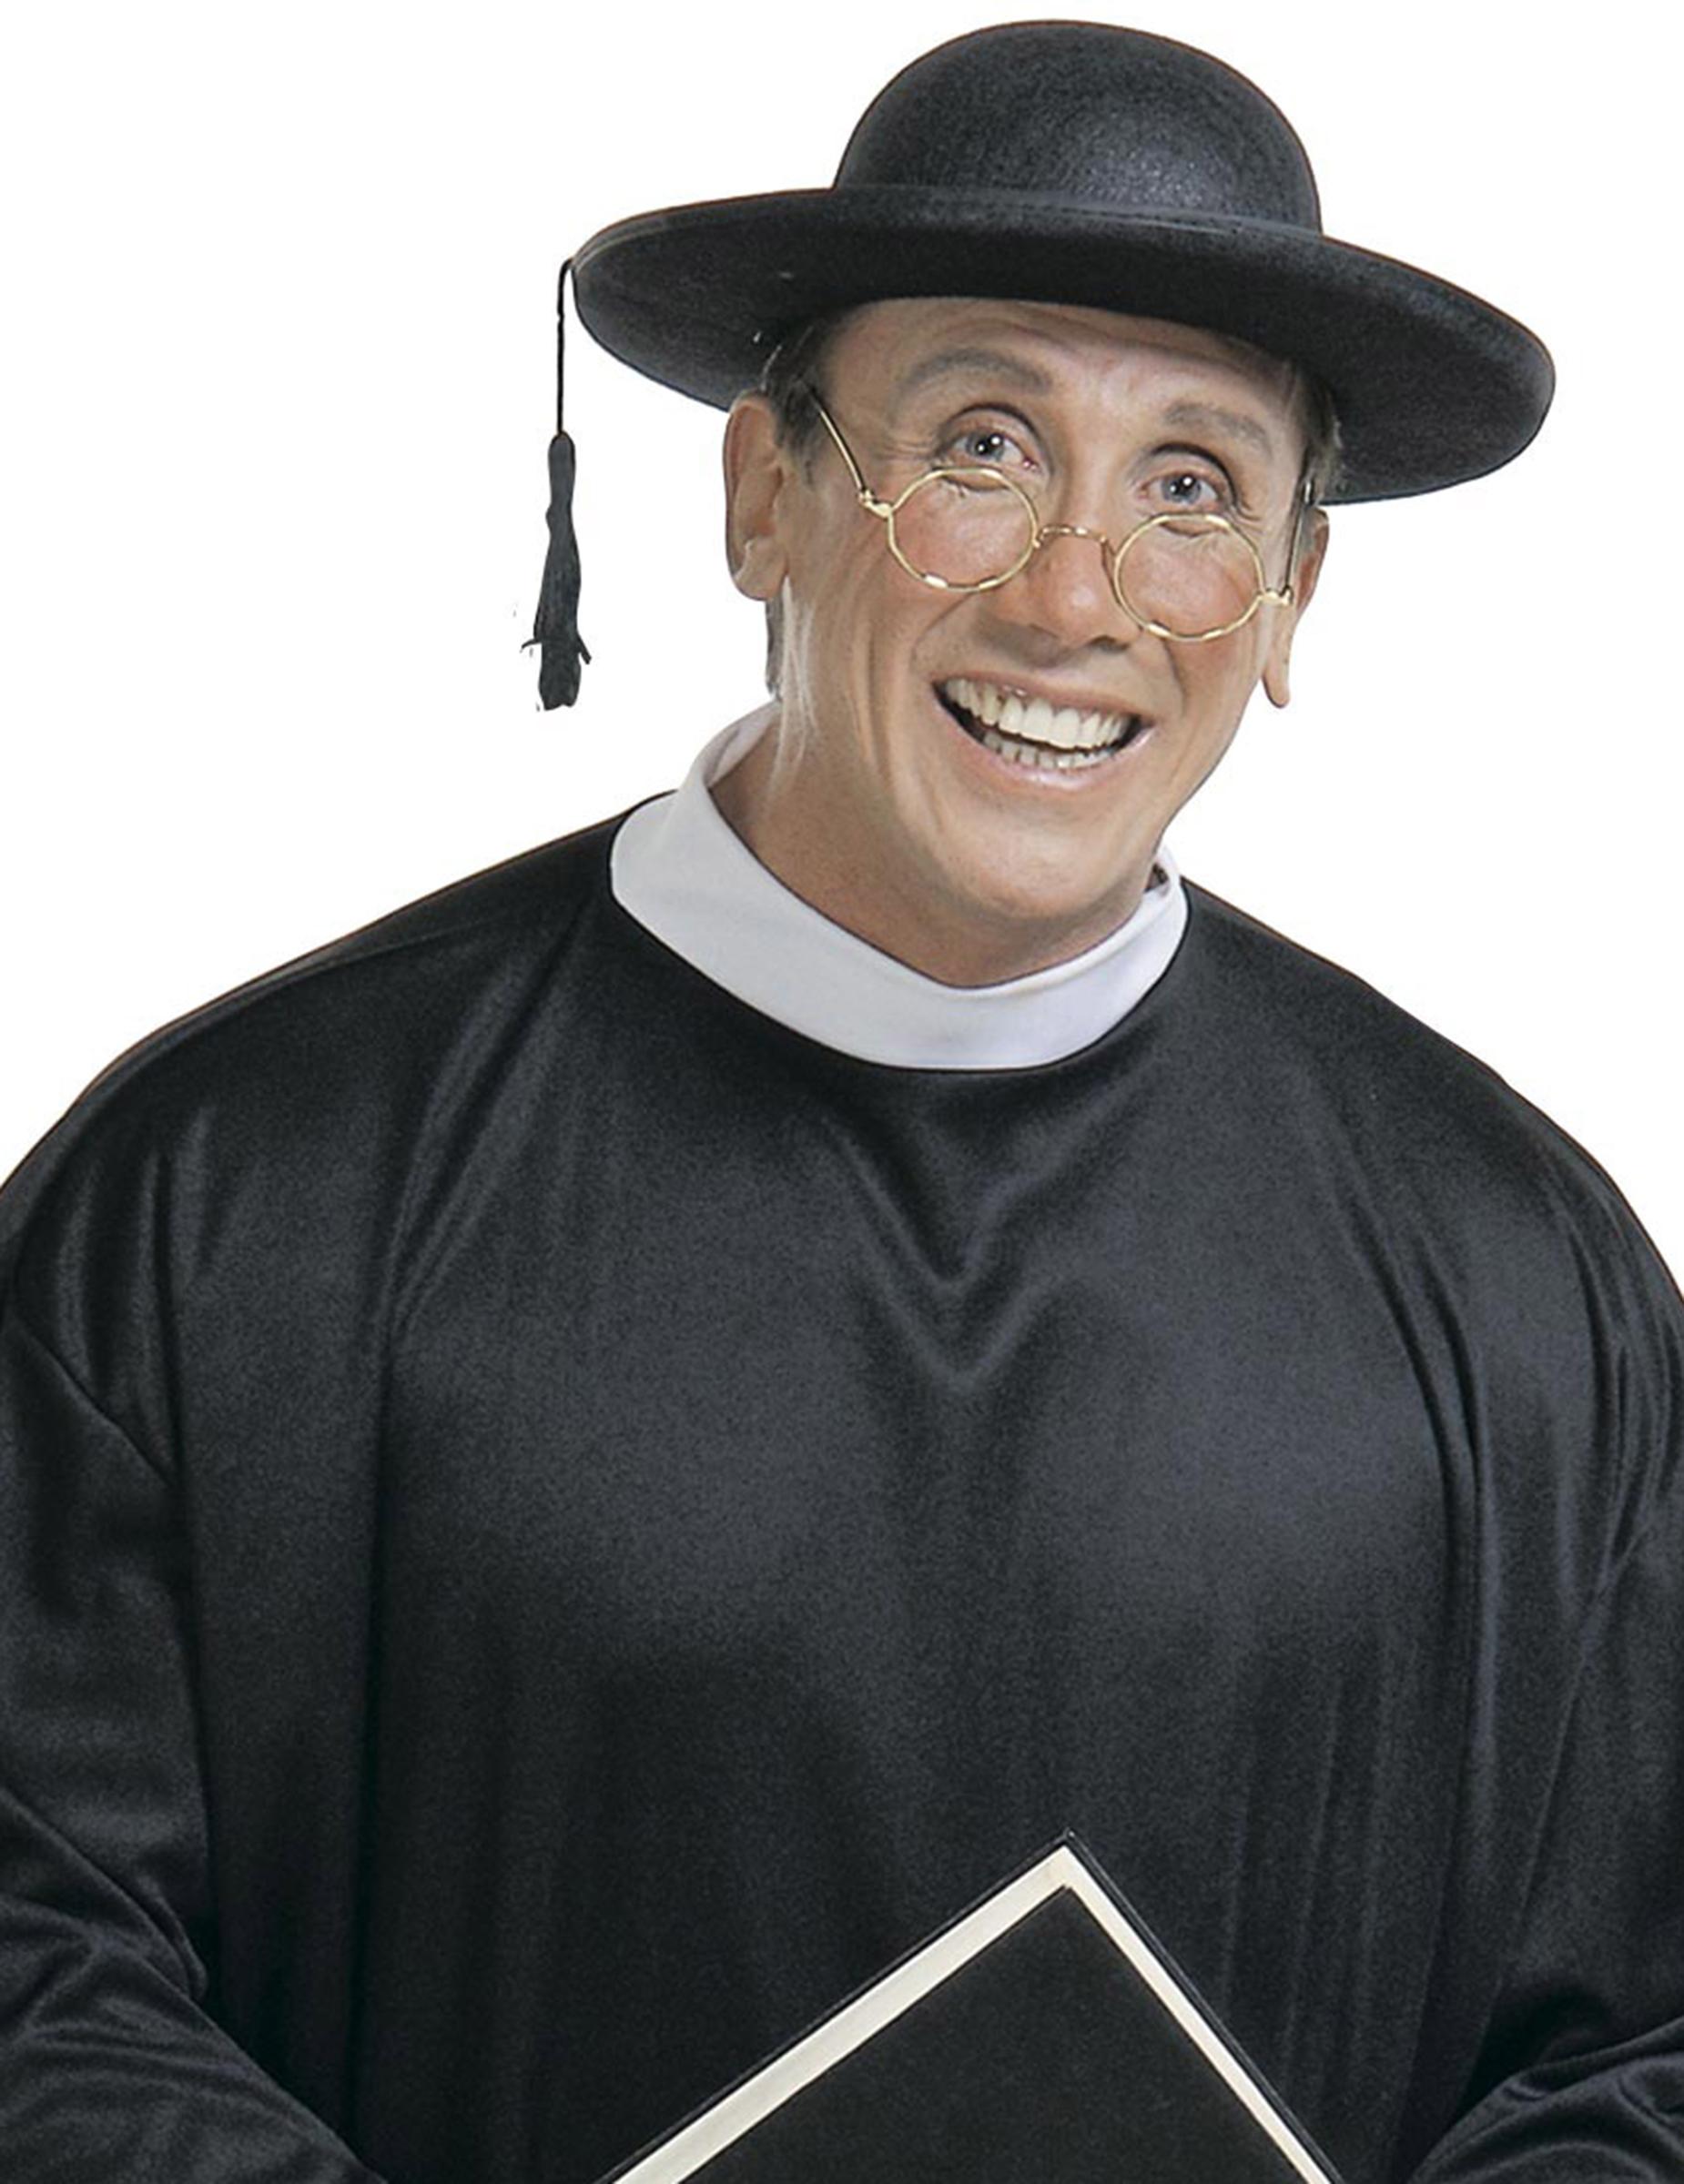 Priester Hut Schwarz Gunstige Faschings Accessoires Zubehor Bei